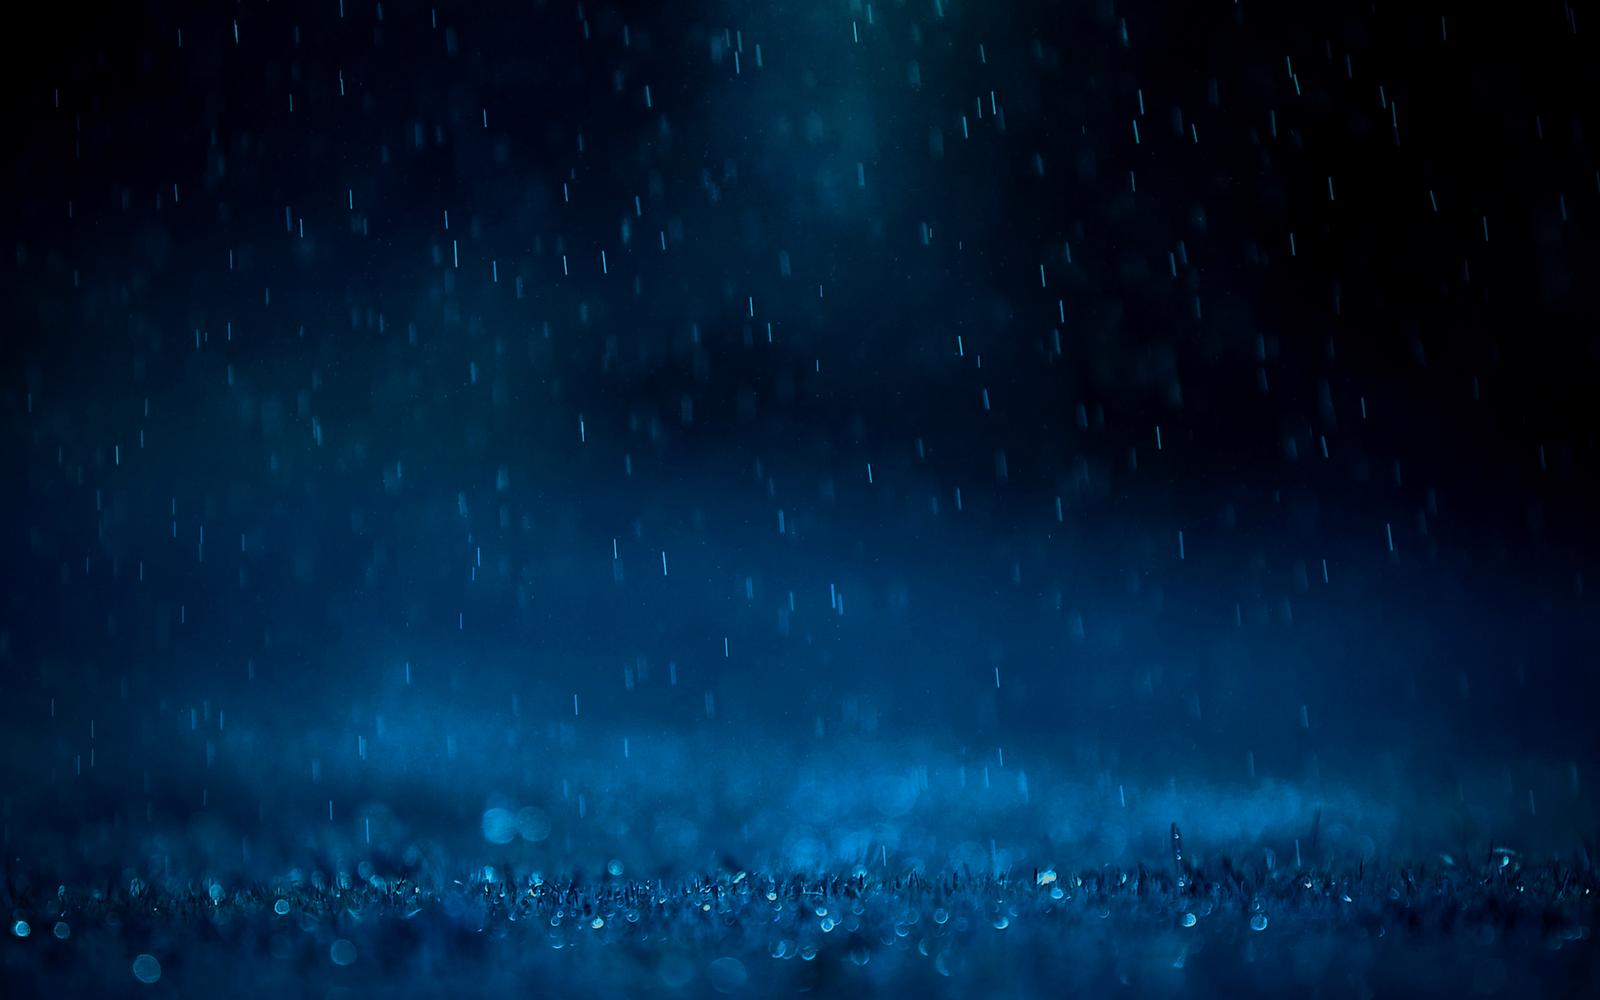 Rain Drops Best Wallpapers